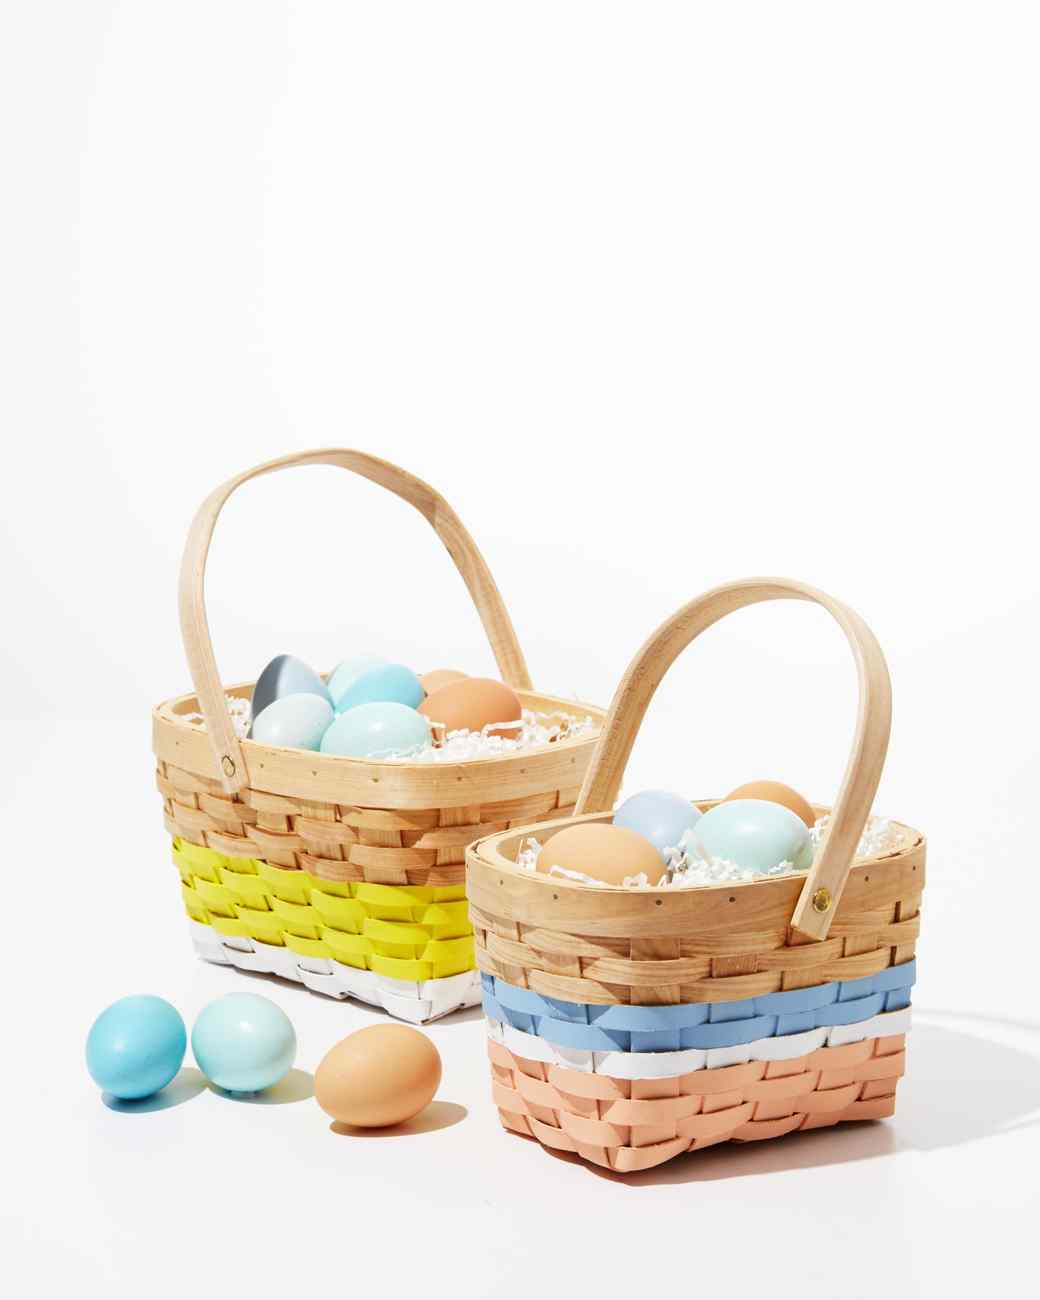 easter-basket-6607-d112853.jpg